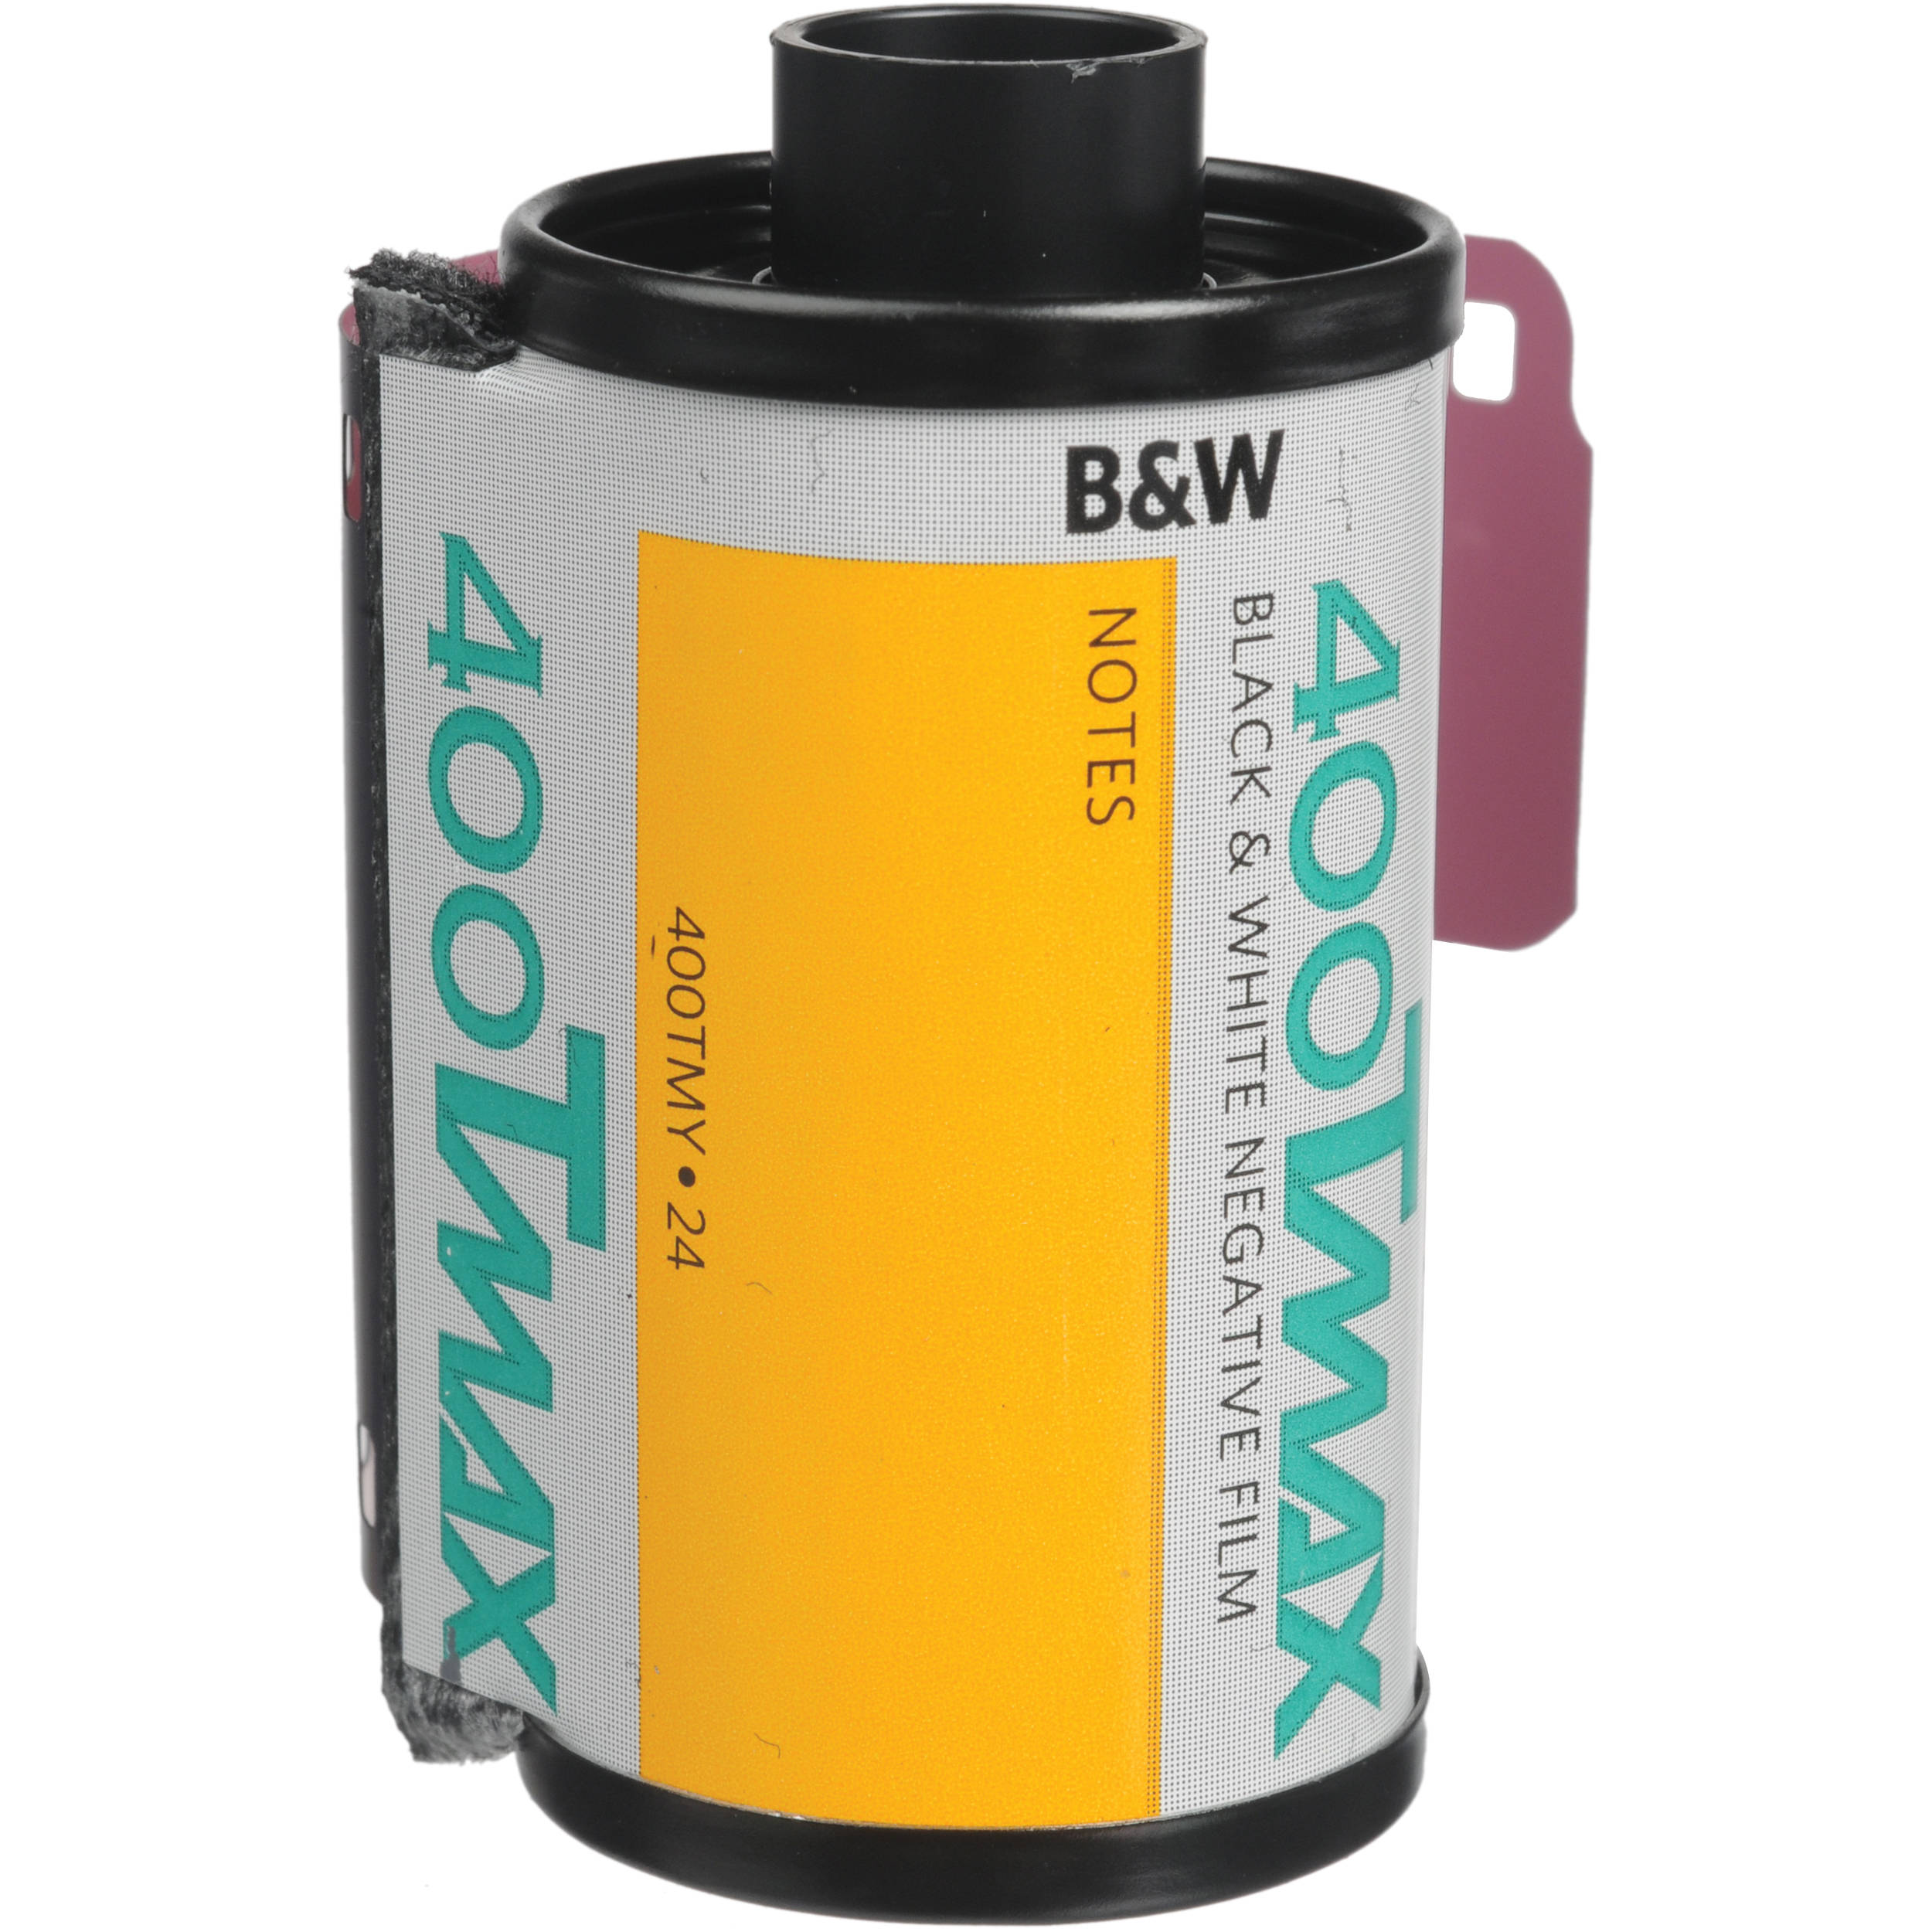 Kodak T-Max 400 120 película de formato